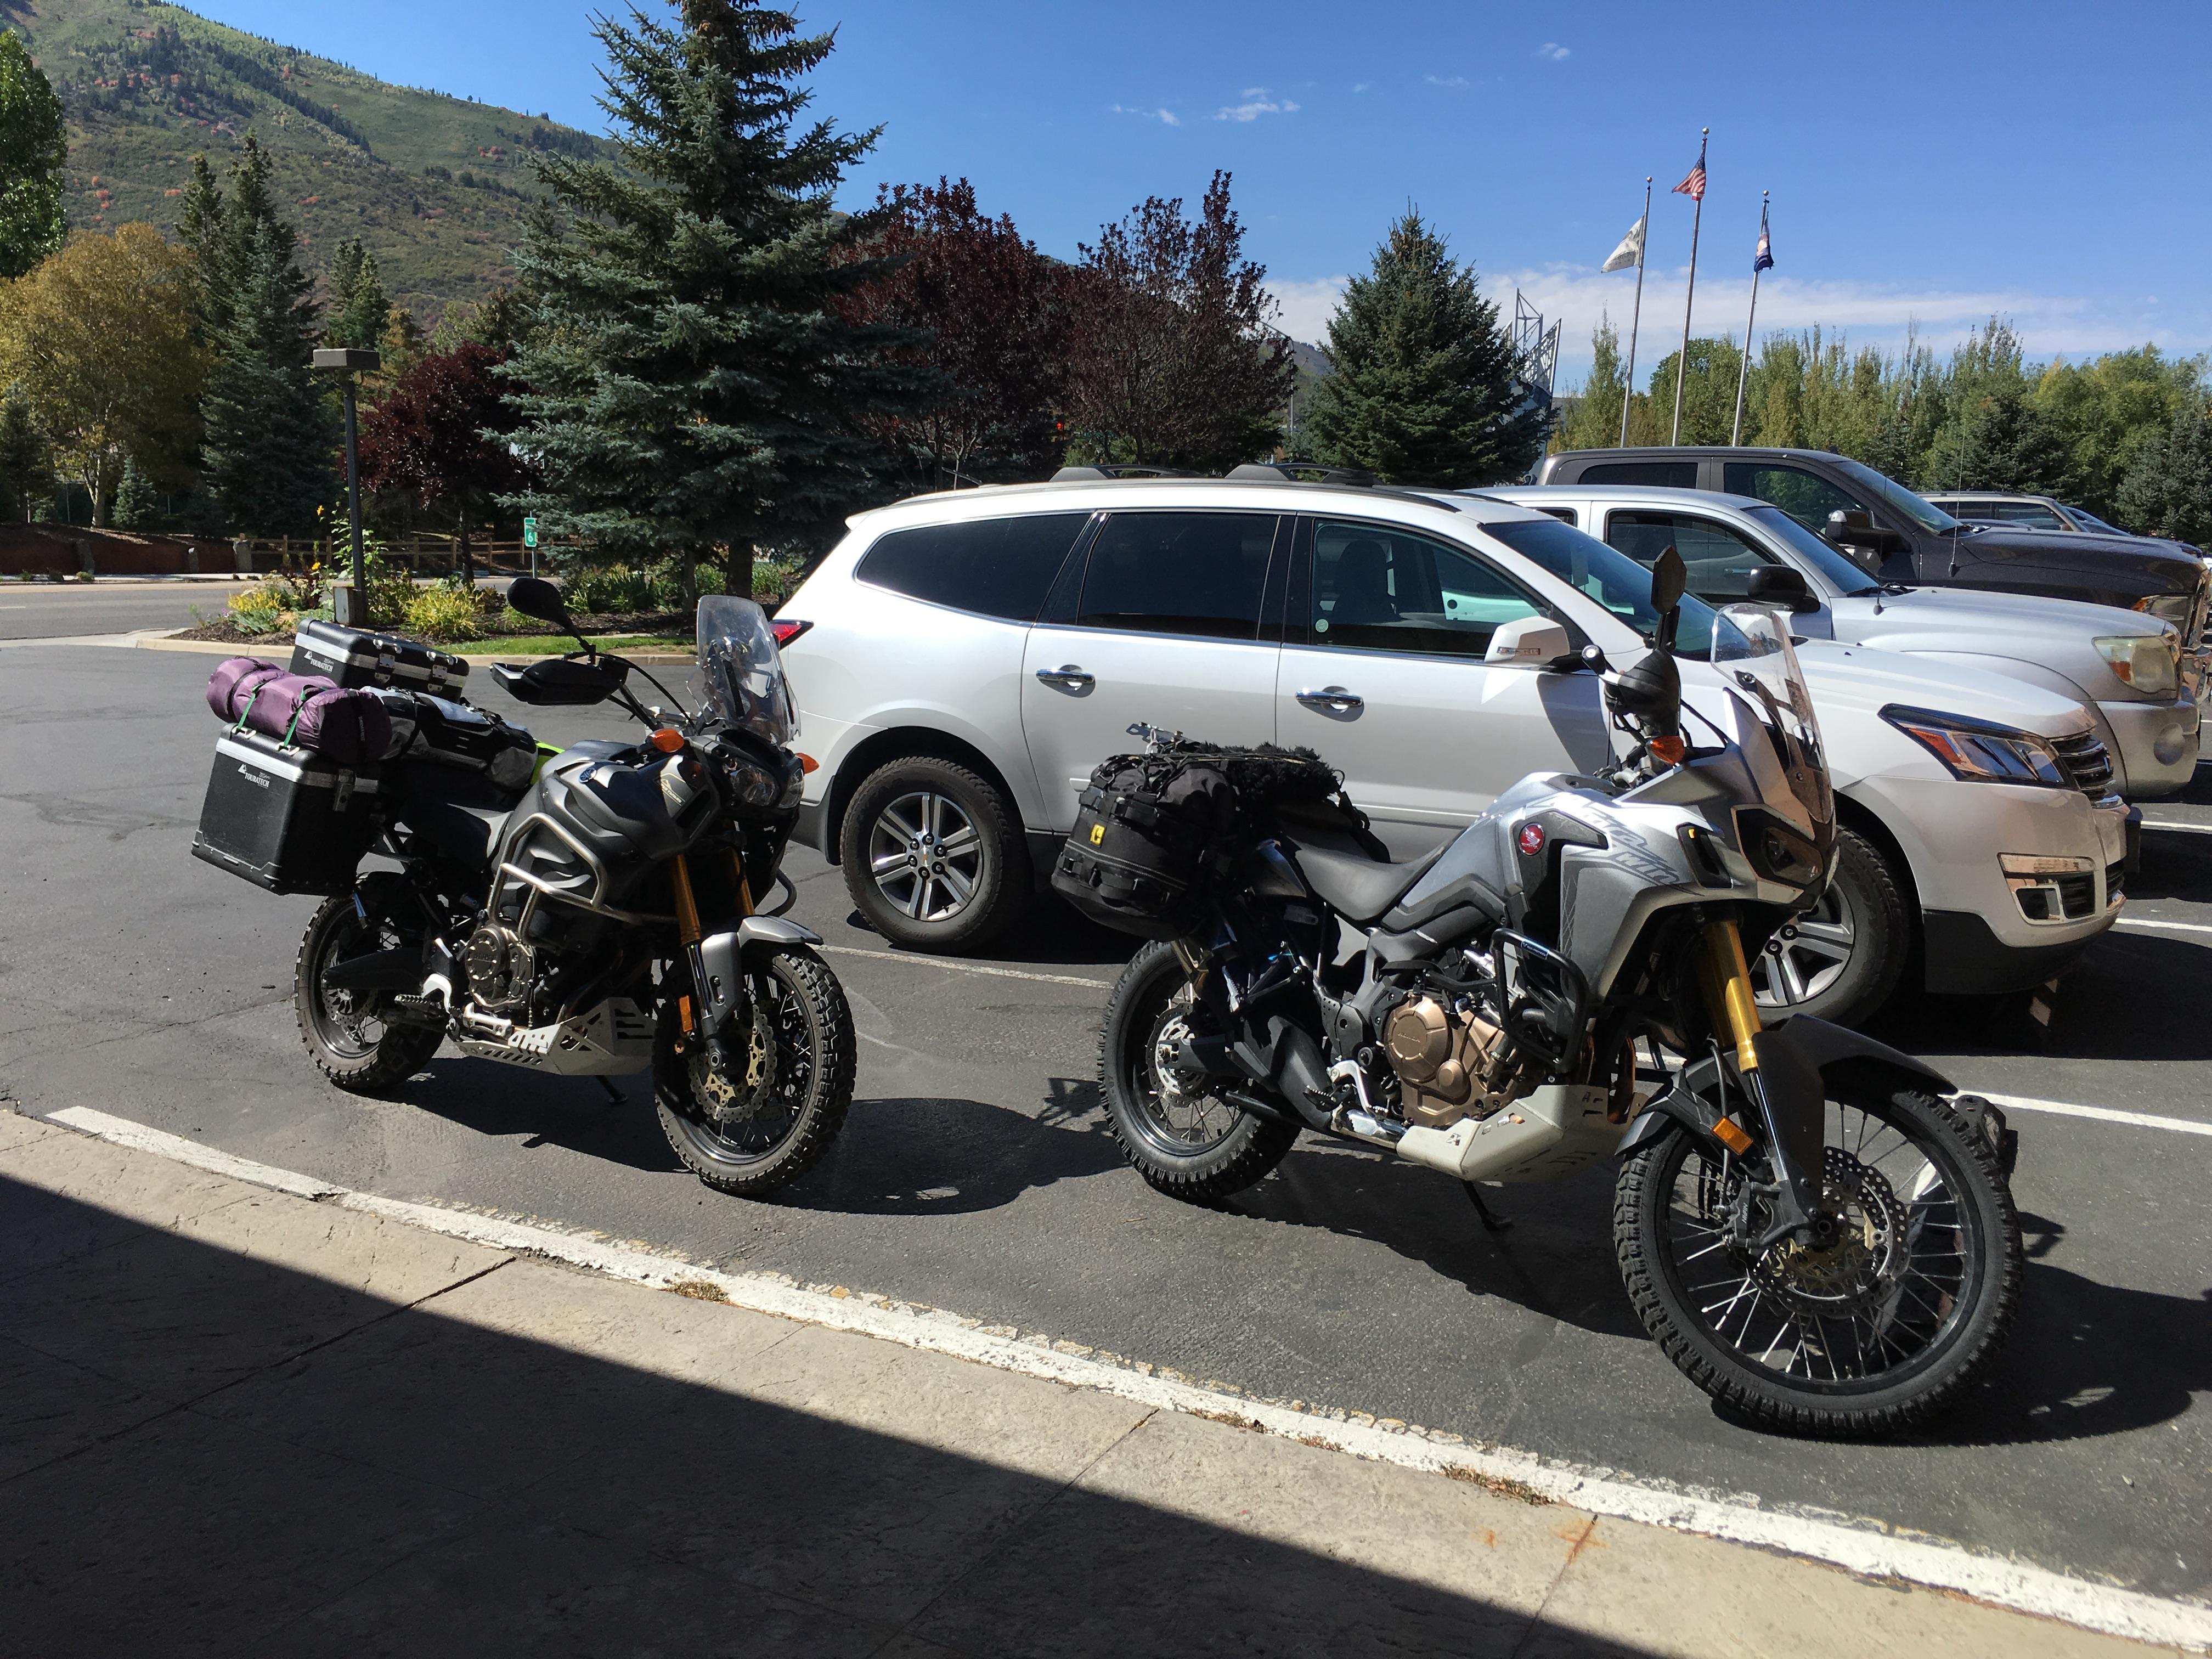 Johnu0027s Yamaha And Rupertu0027s Honda Parked Outside The Hilton Hotel In Park  City, Utah